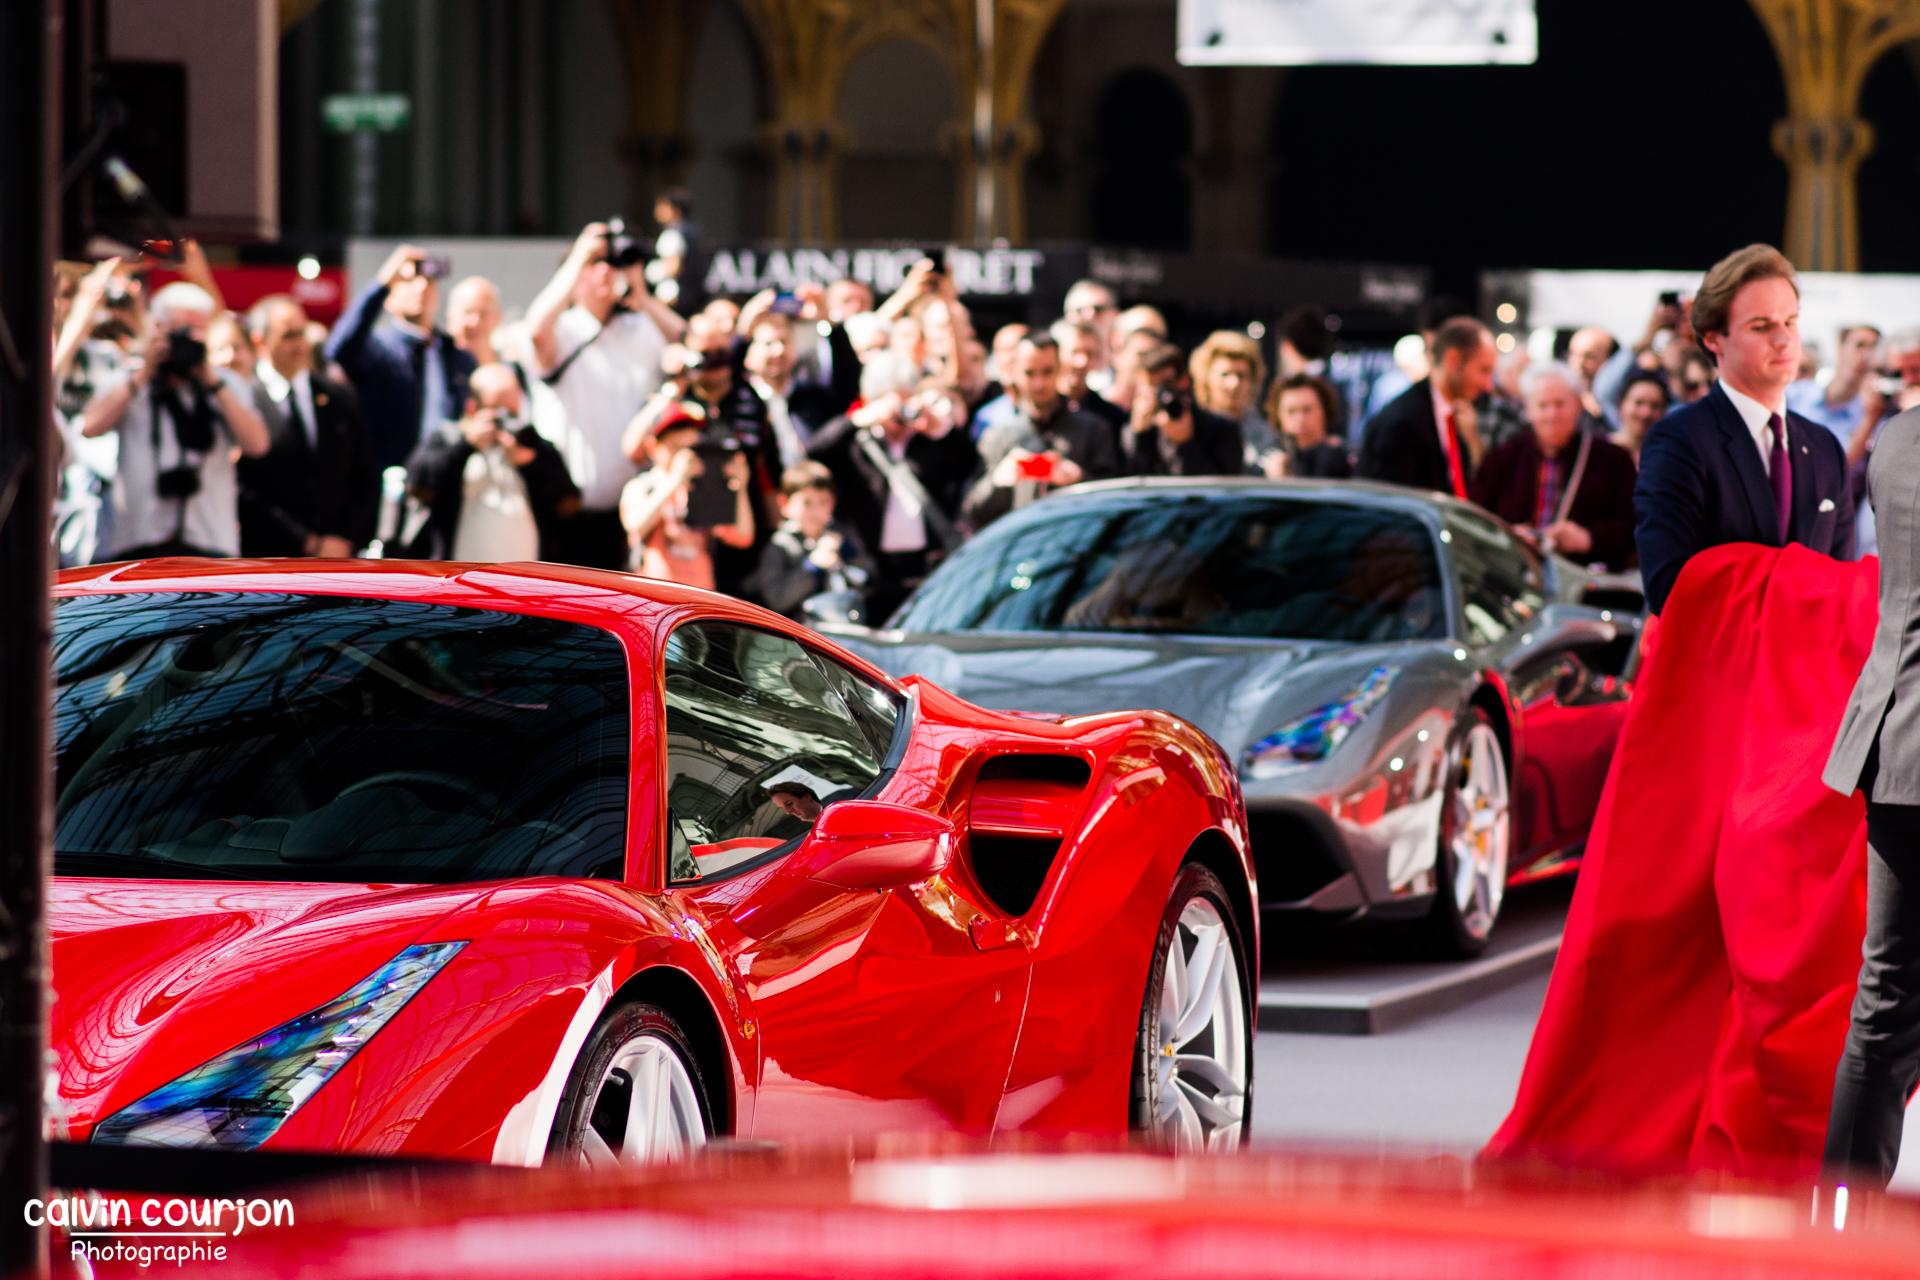 Ferrari 488 - Tour Auto 2015 - Calvin Courjon Photographie